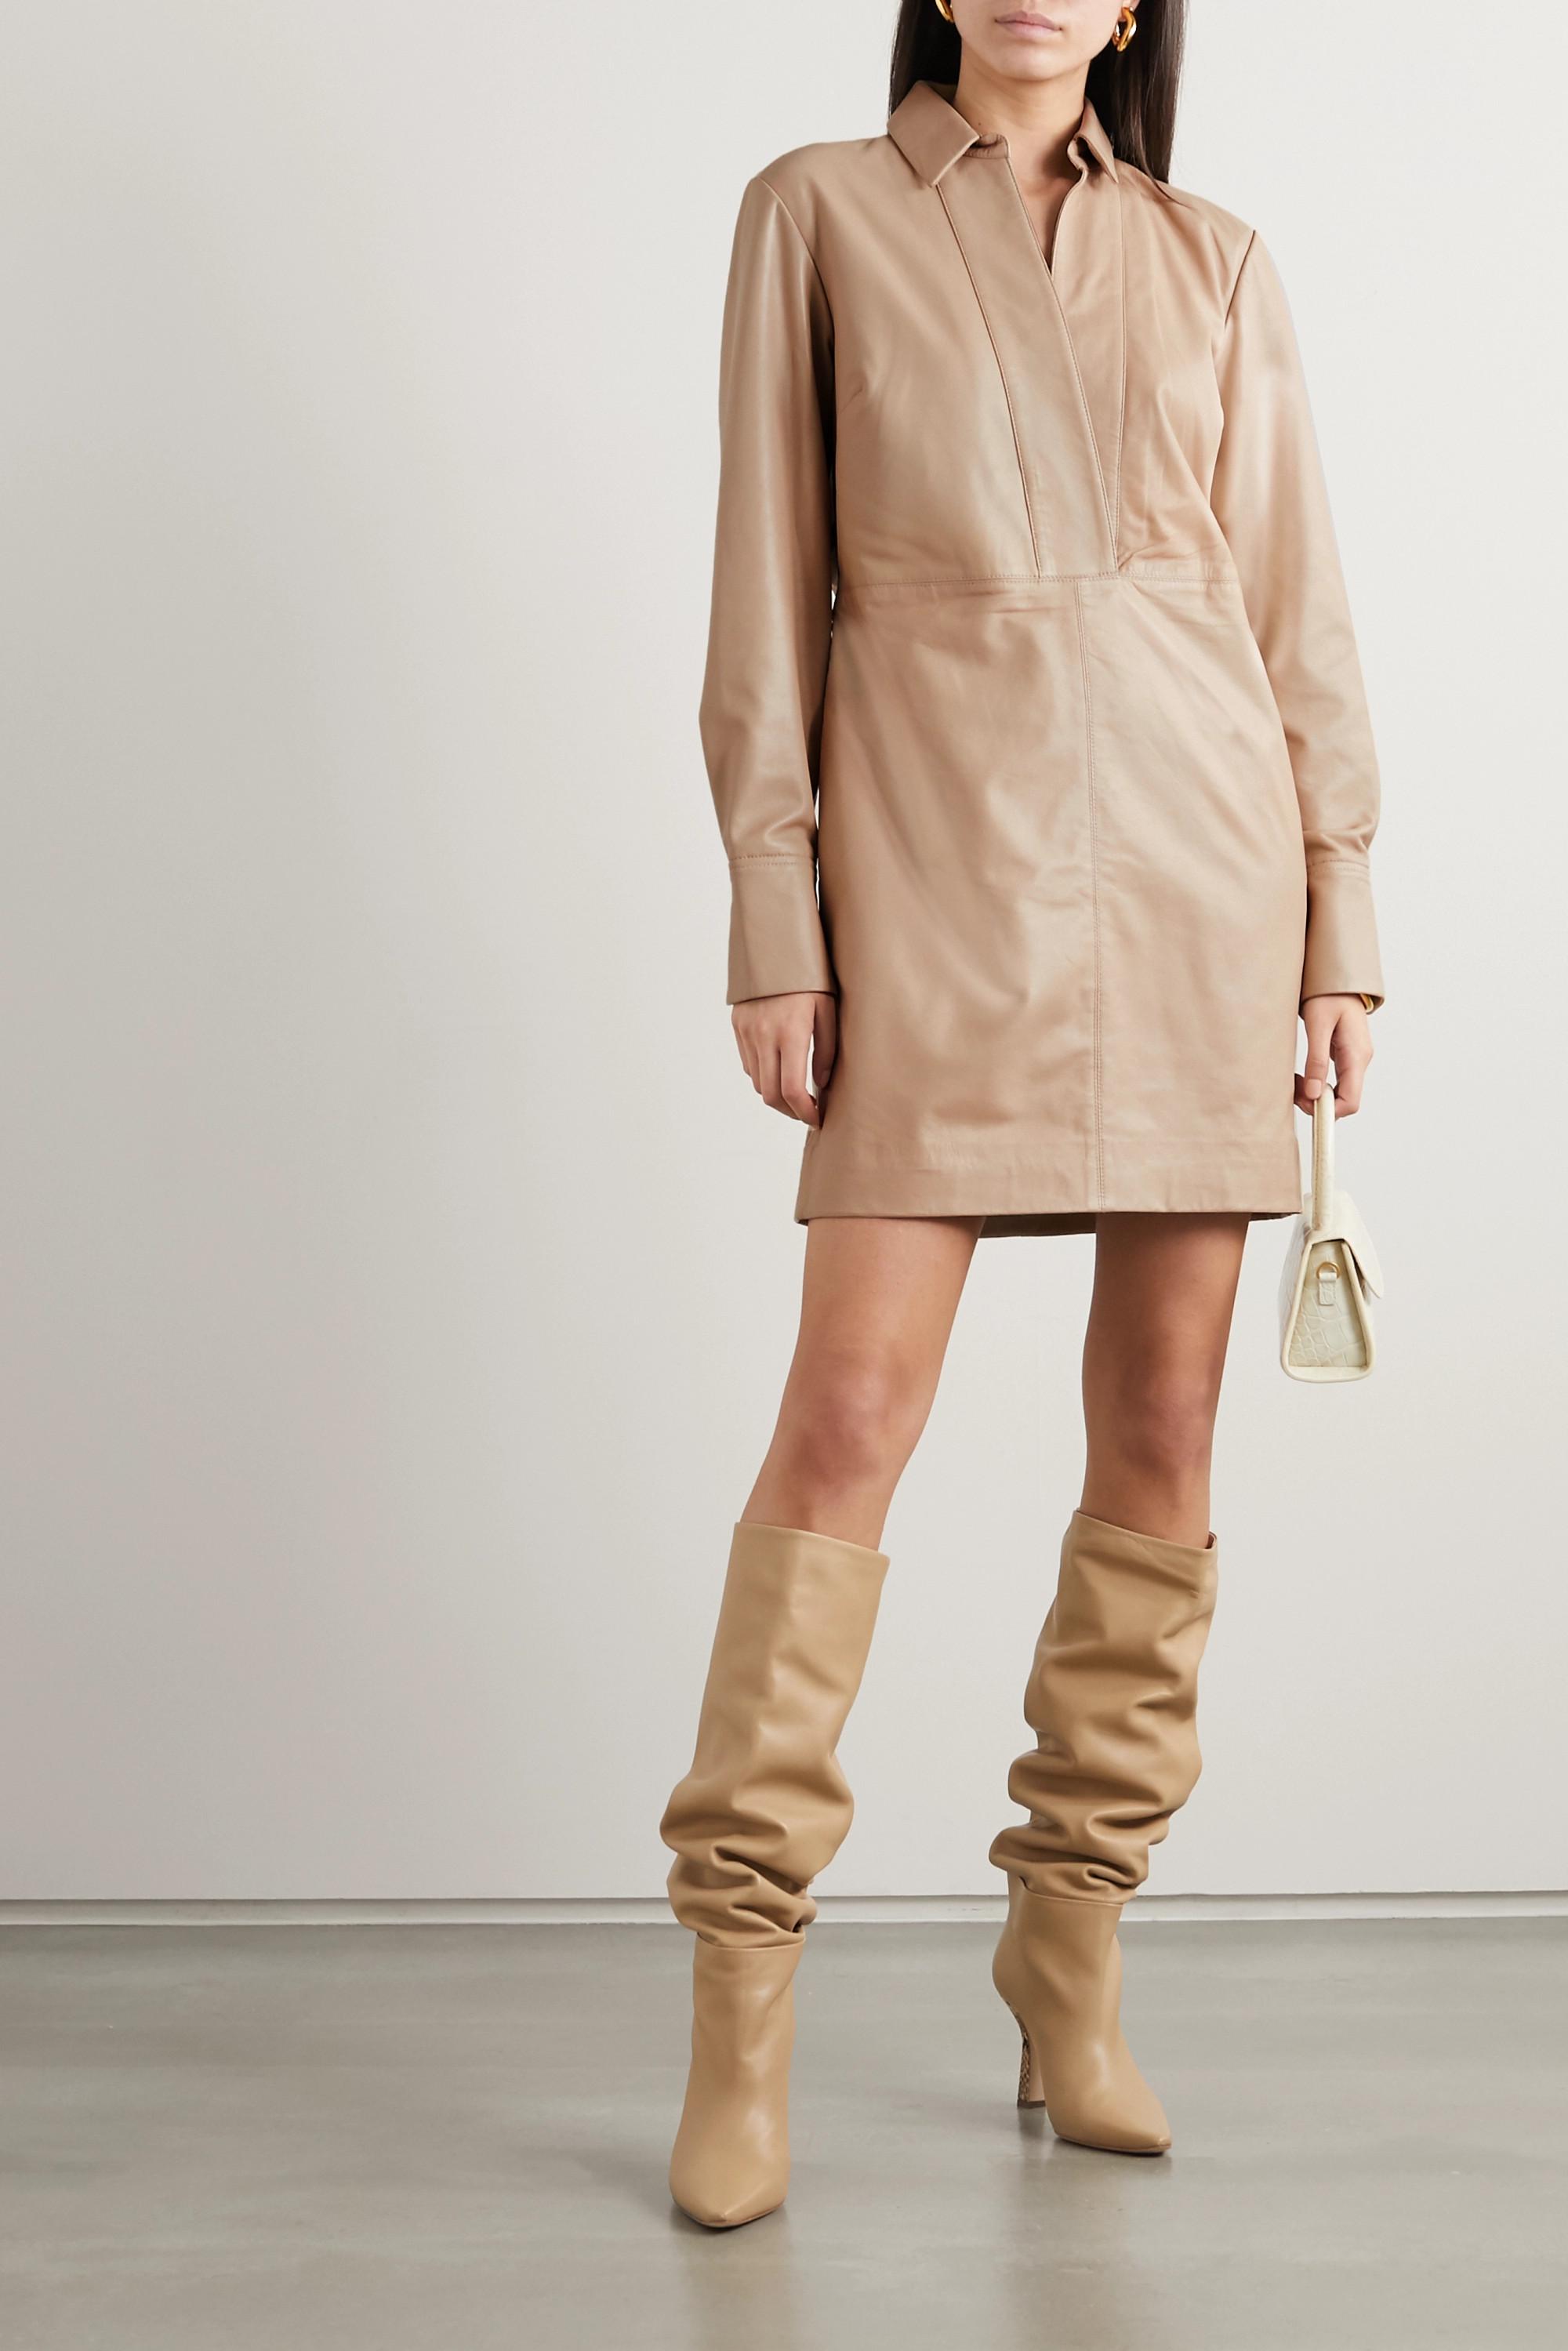 EQUIPMENT Riannon leather mini dress